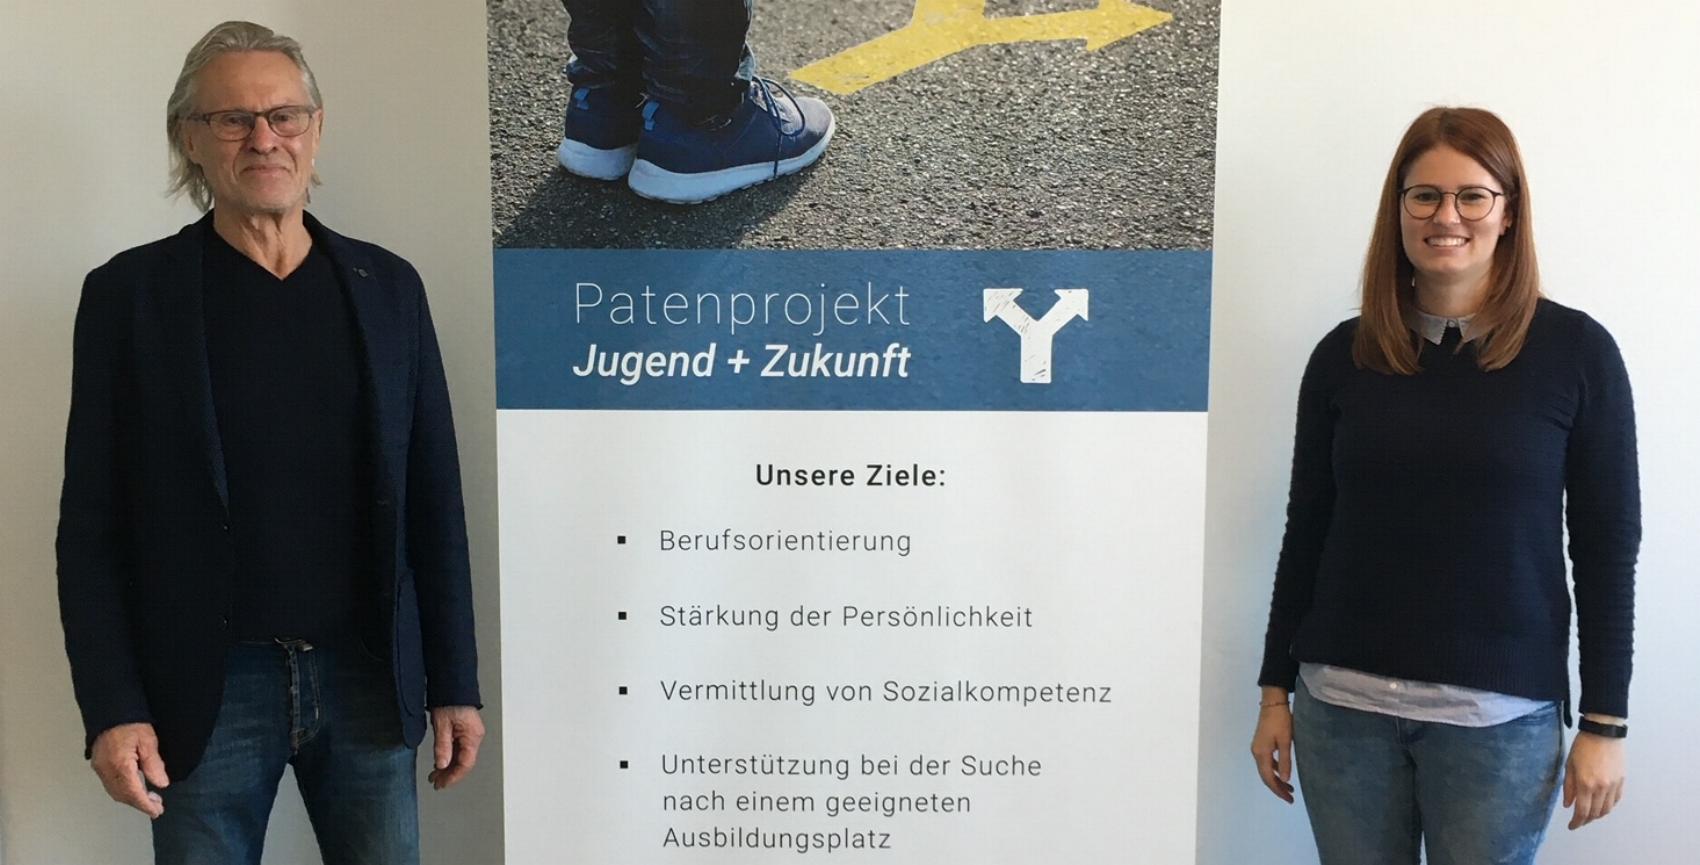 Patenprojekt Jugend und Zukunft Landratsamt Dillingen